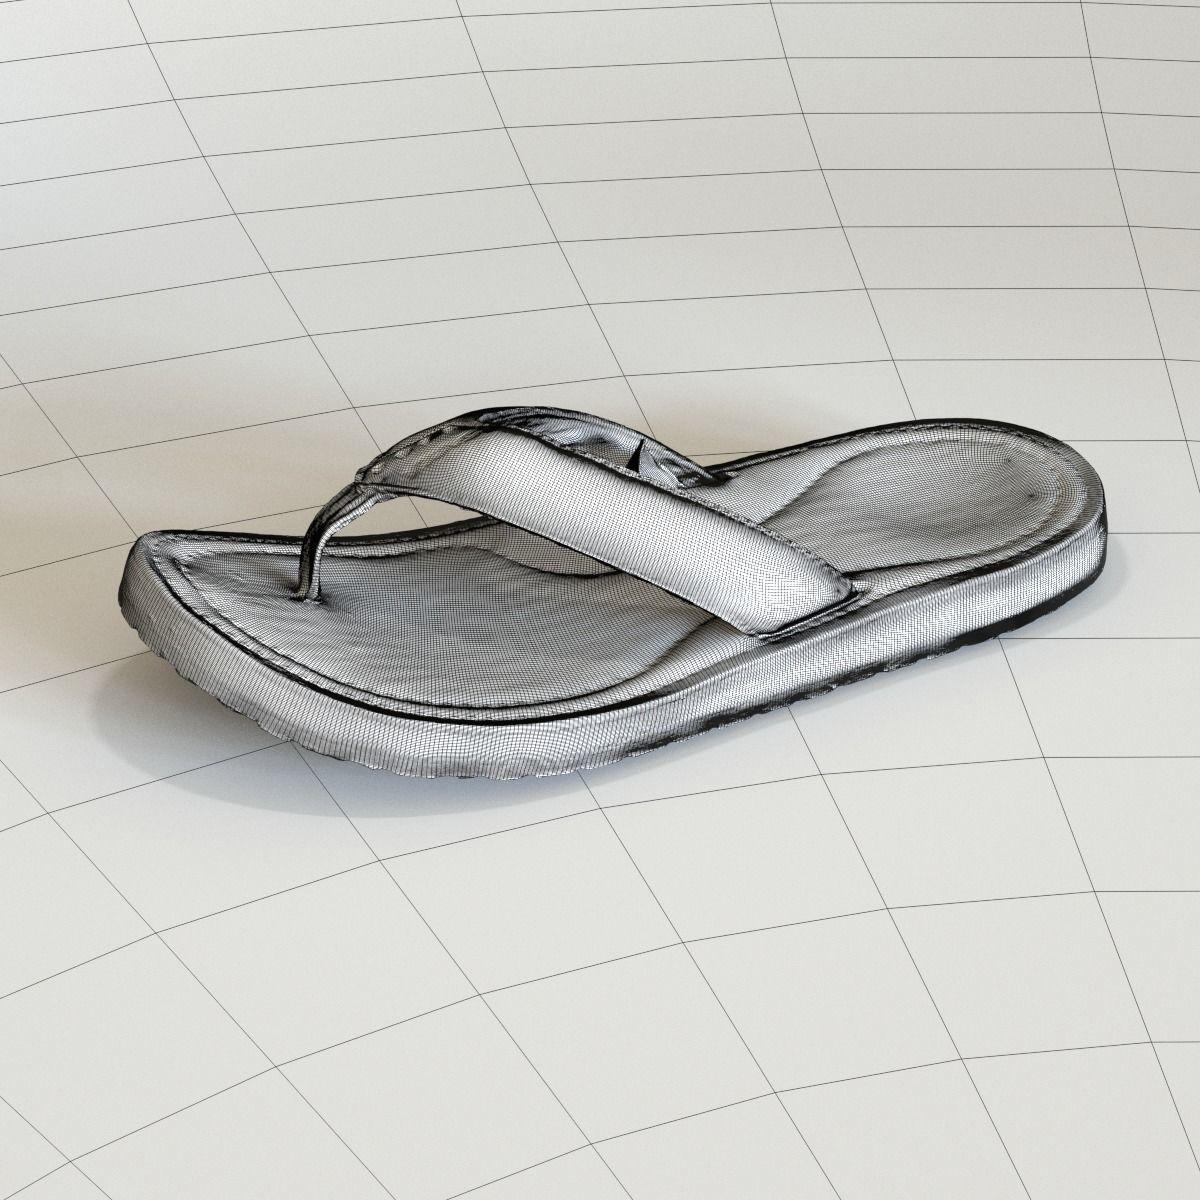 c39414c5510ab1 ... 1  old teva sandal 3d model max fbx c4d ma mb 2 ...